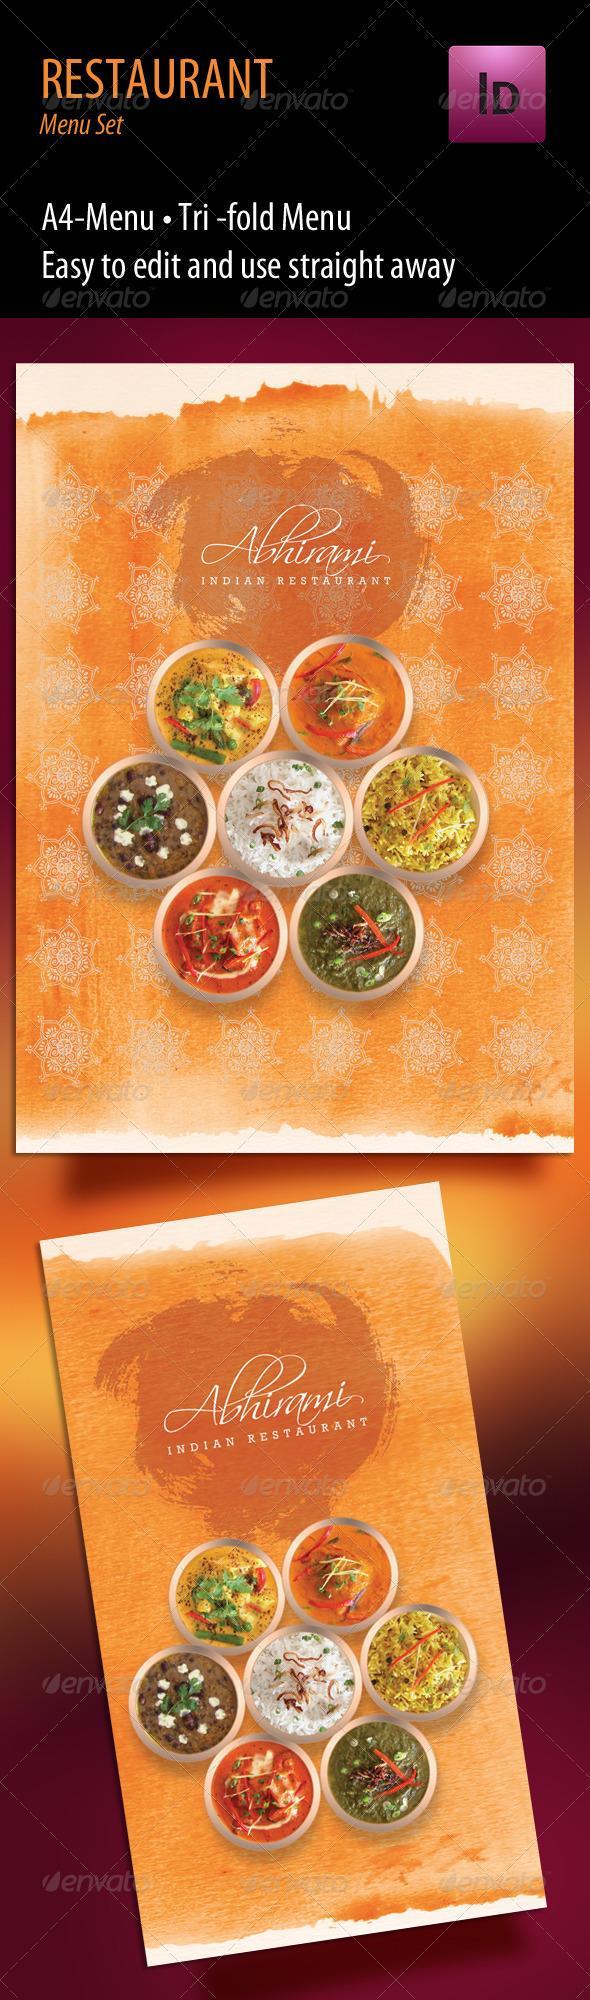 Indian Restaurant Menu set - A4 & Trifold | Elementos